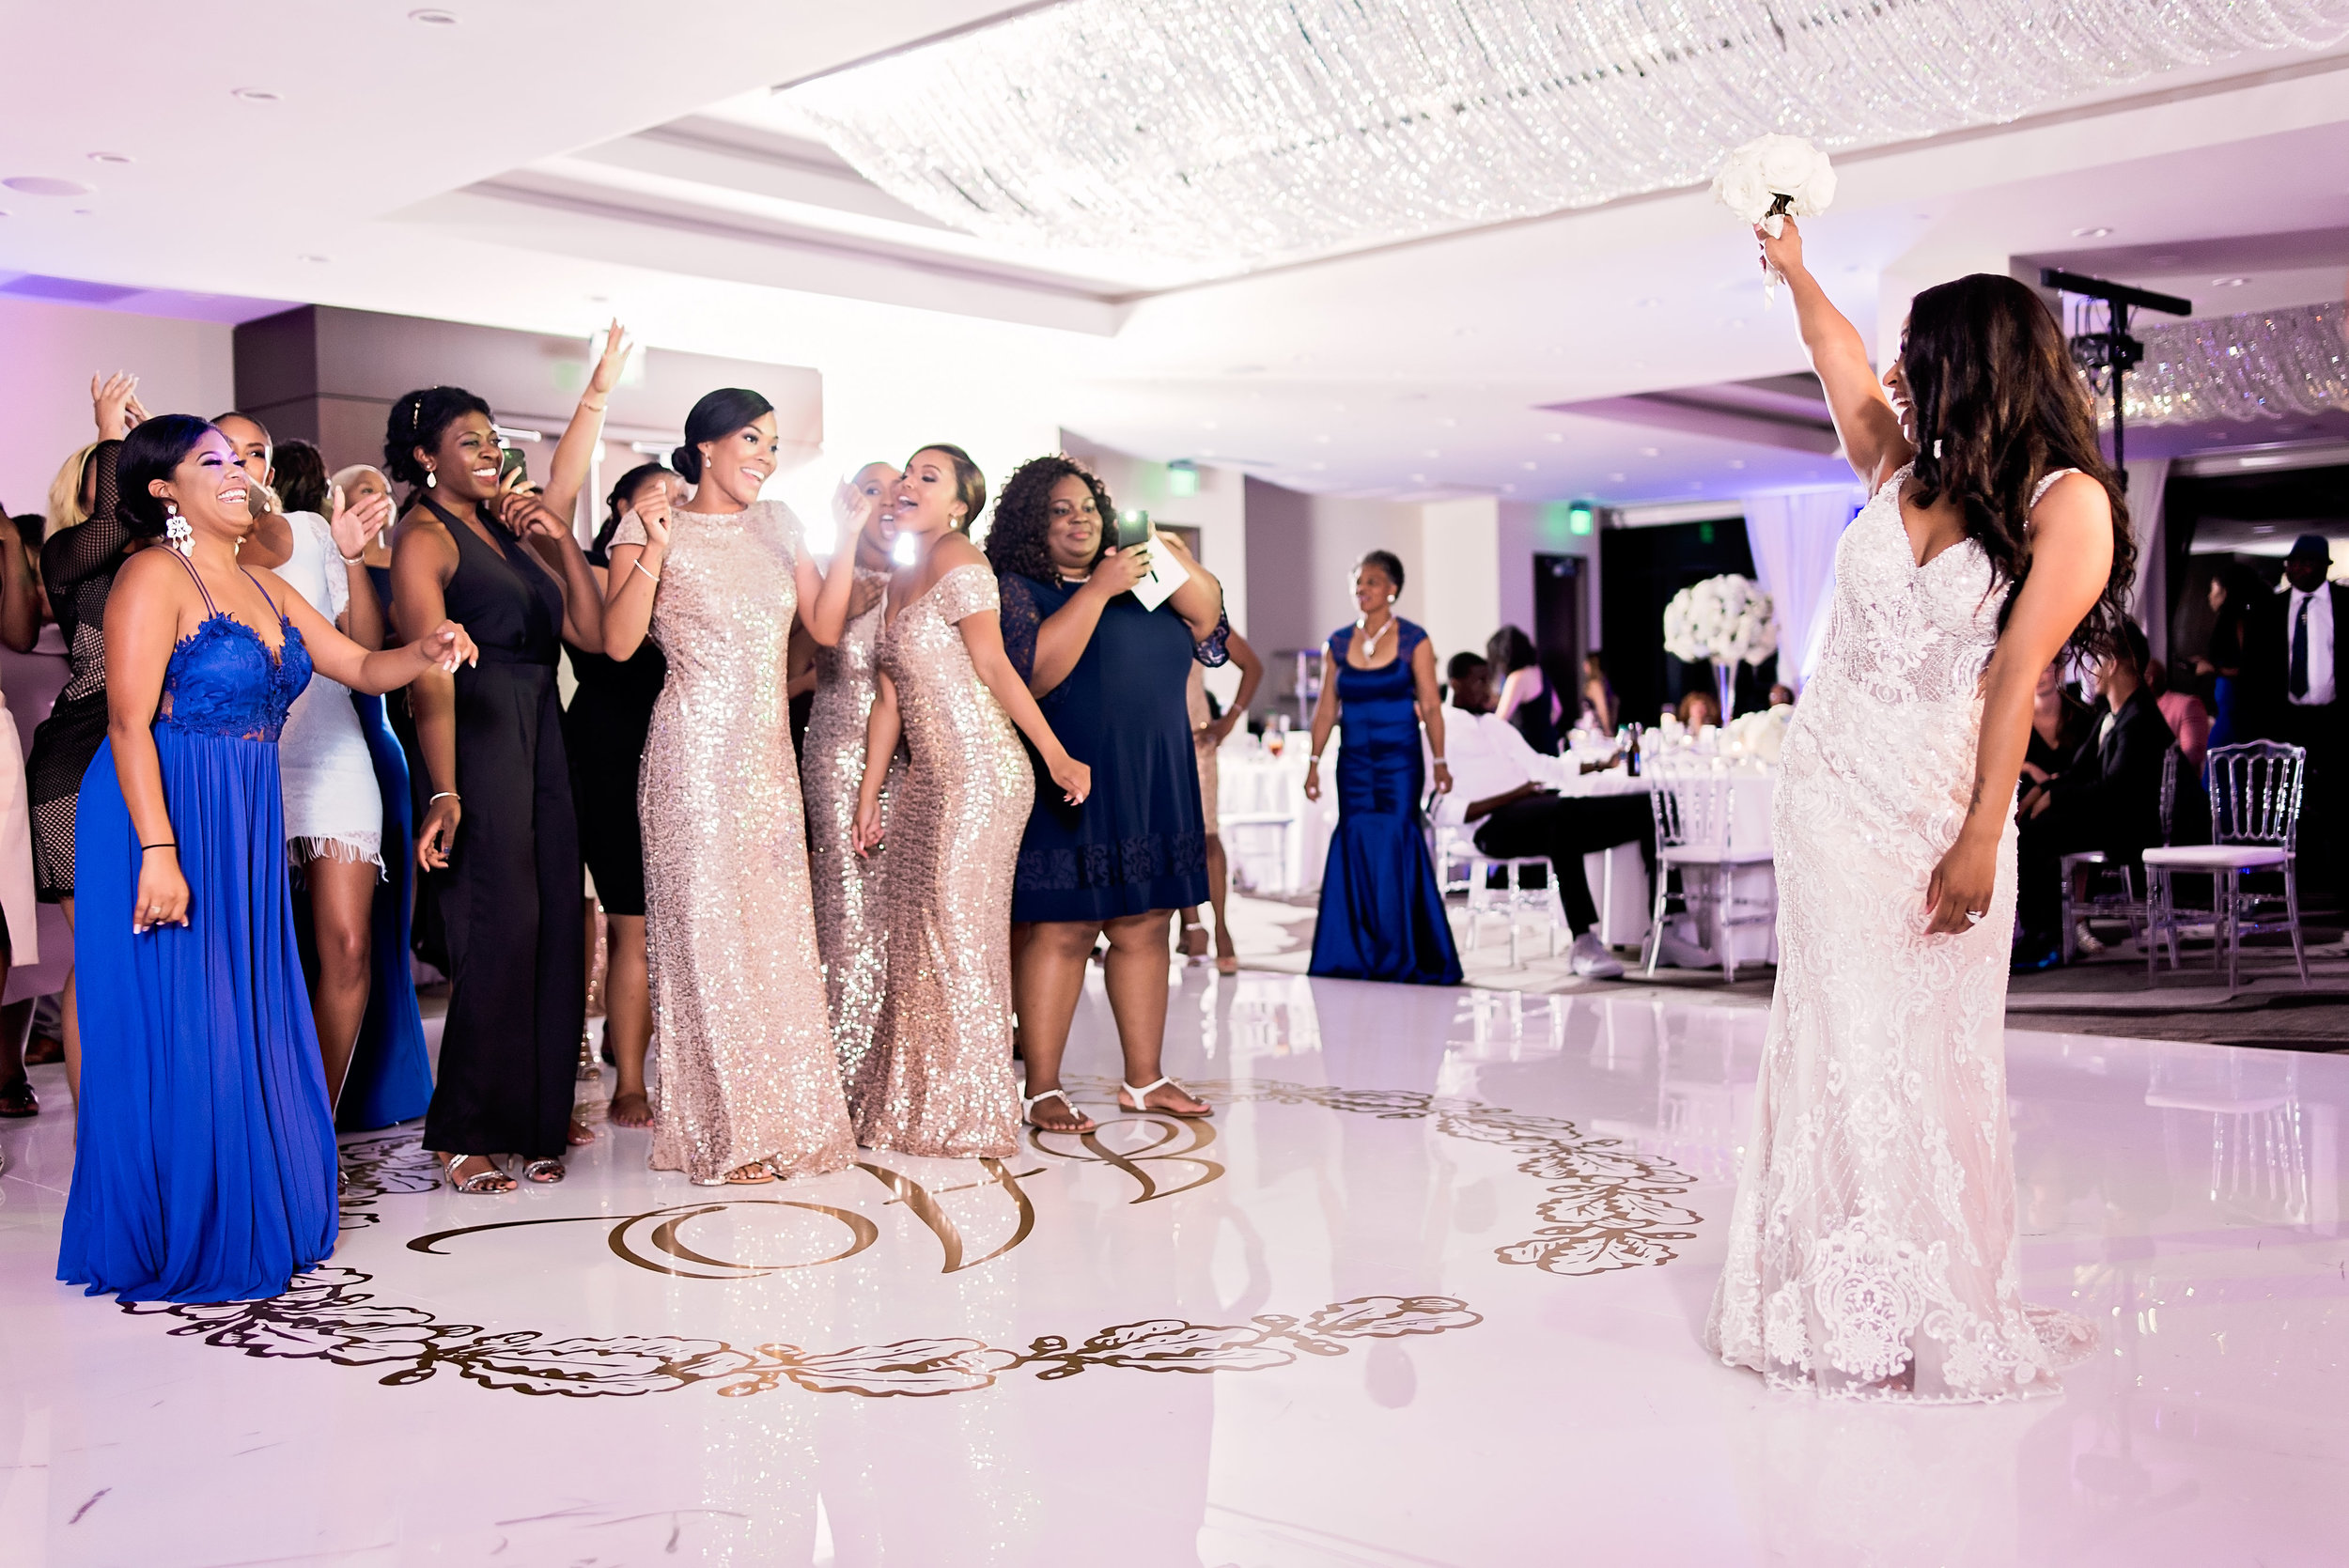 Enchanting-Wedding-Jessica-Quincy-Pharris-Photos129.jpg